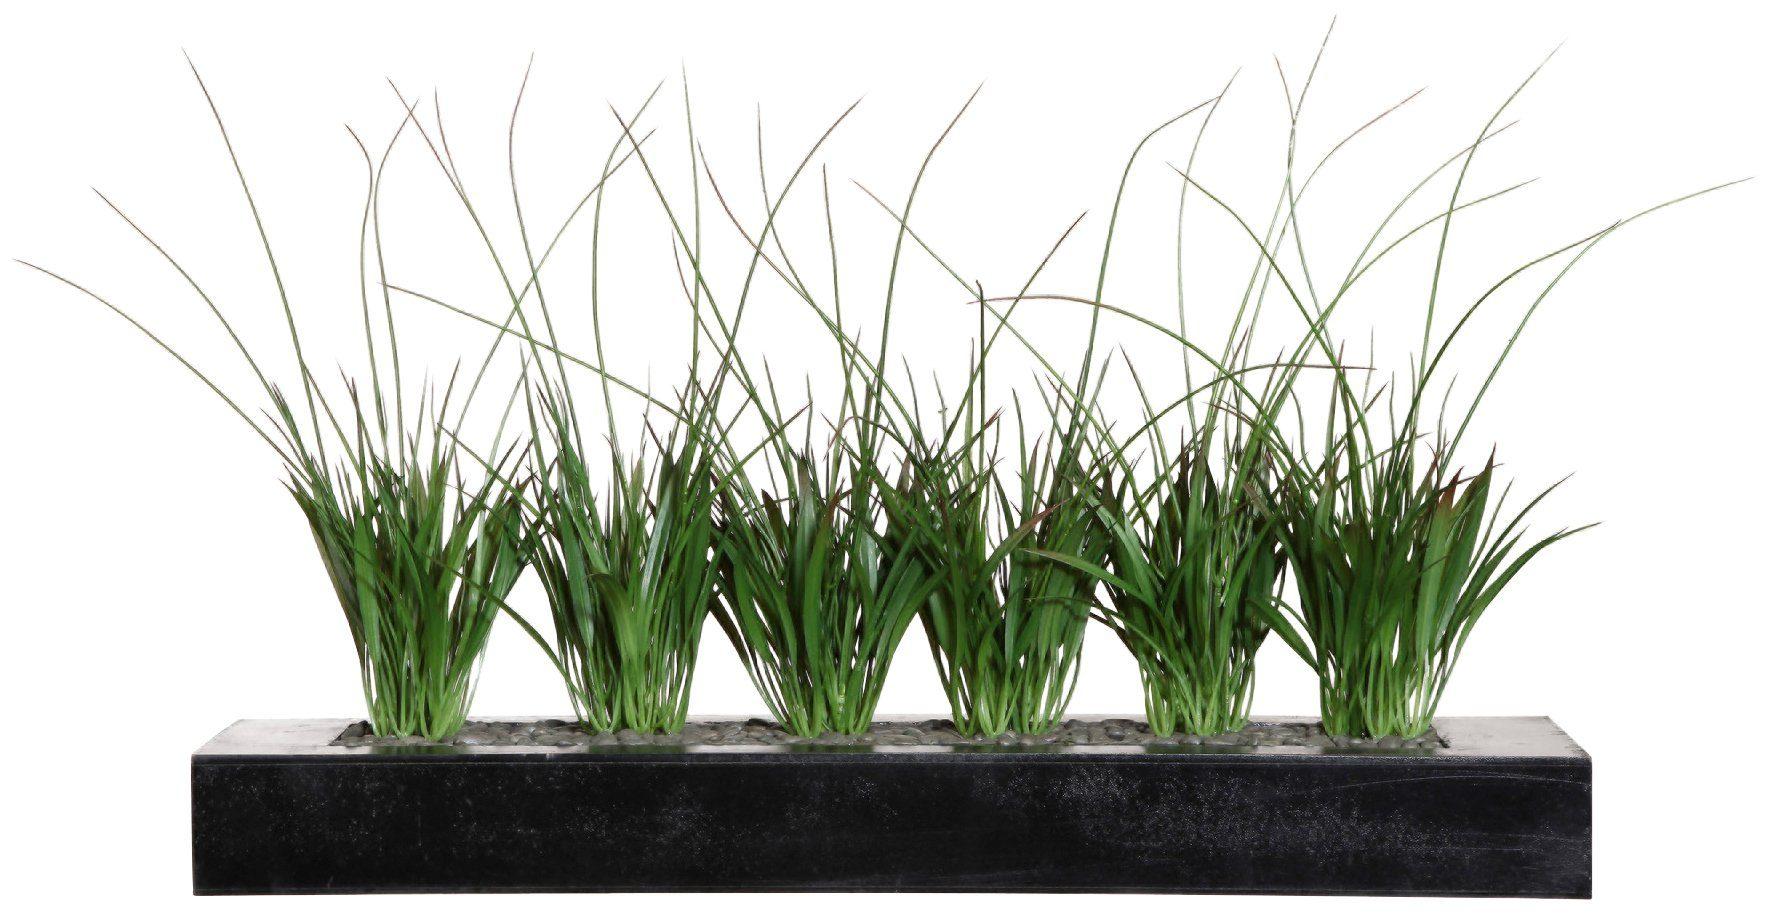 Kunstpflanze »Mini-Raumteiler mit Gras«, aus Holz, BxTxH: 63x15x6 cm